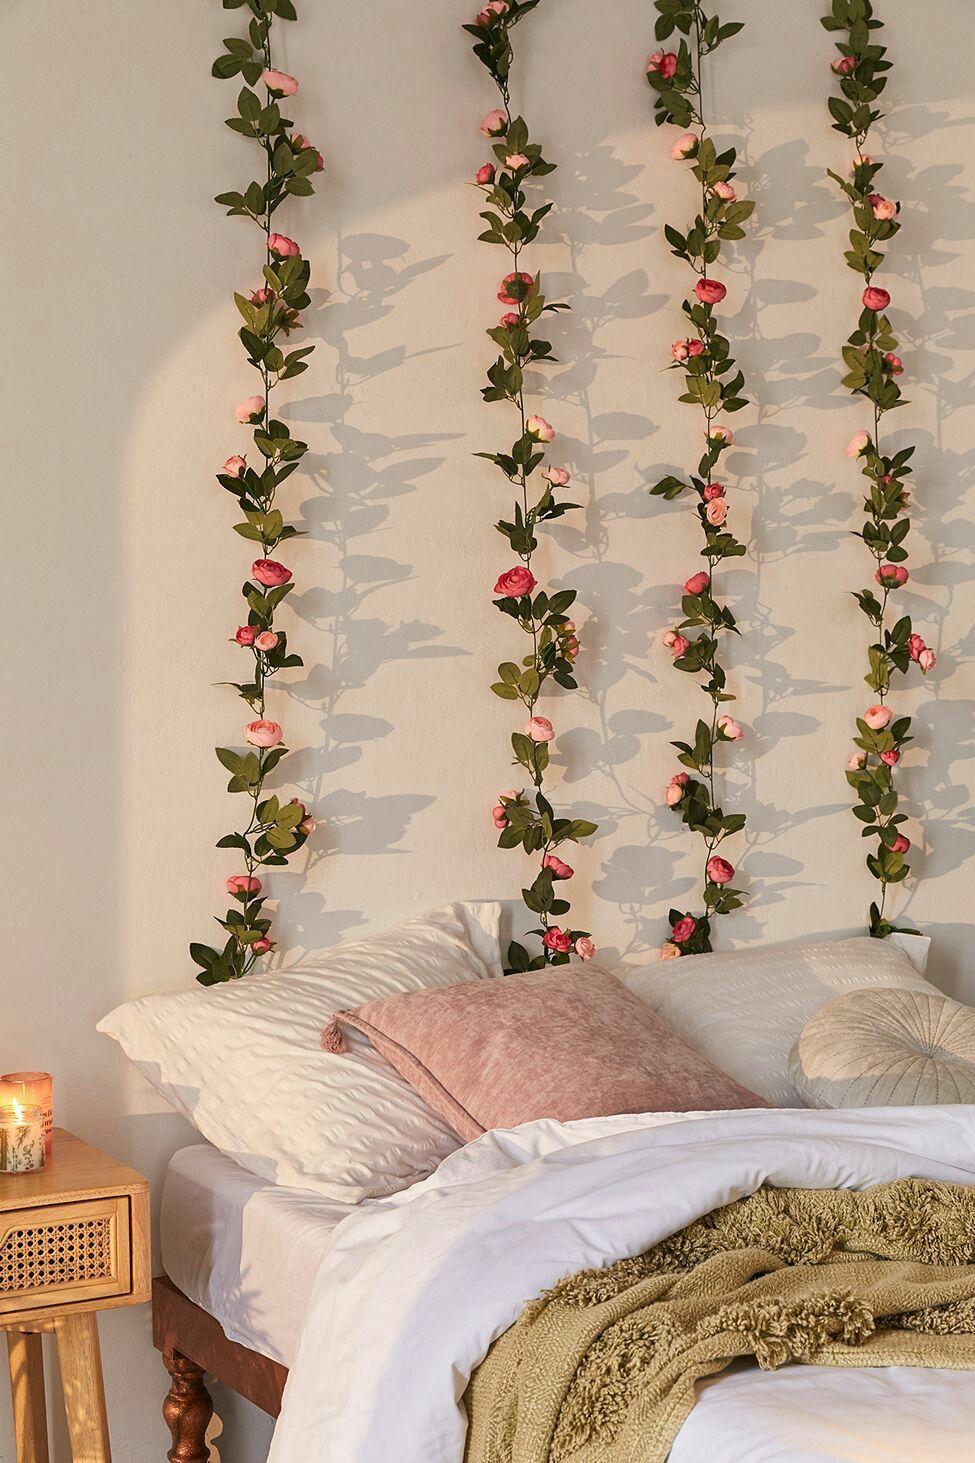 Pinterest Sarah Faith With Images Aesthetic Room Decor Room